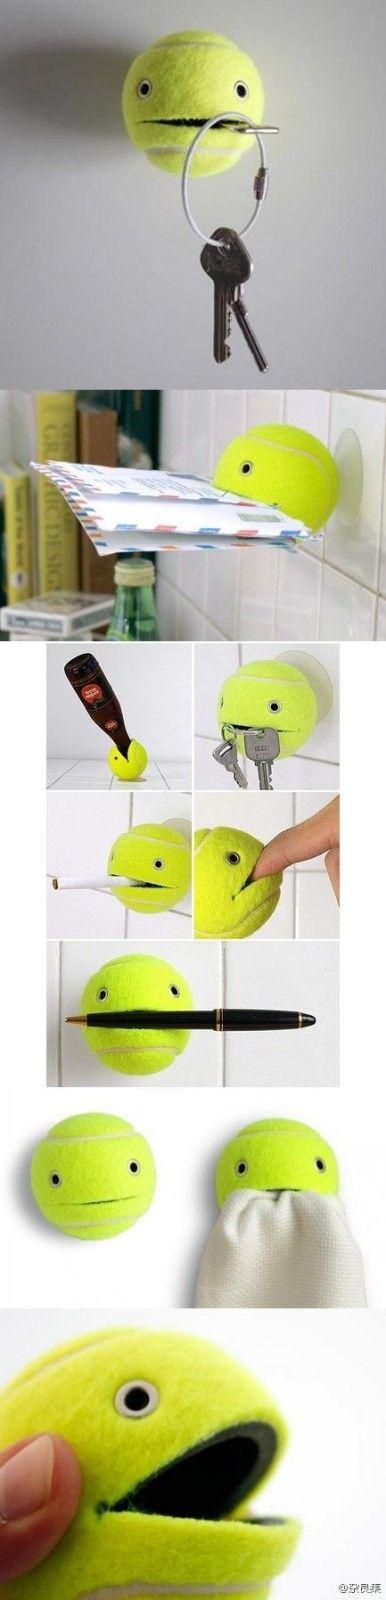 Balle de tennis crochet bonhomme